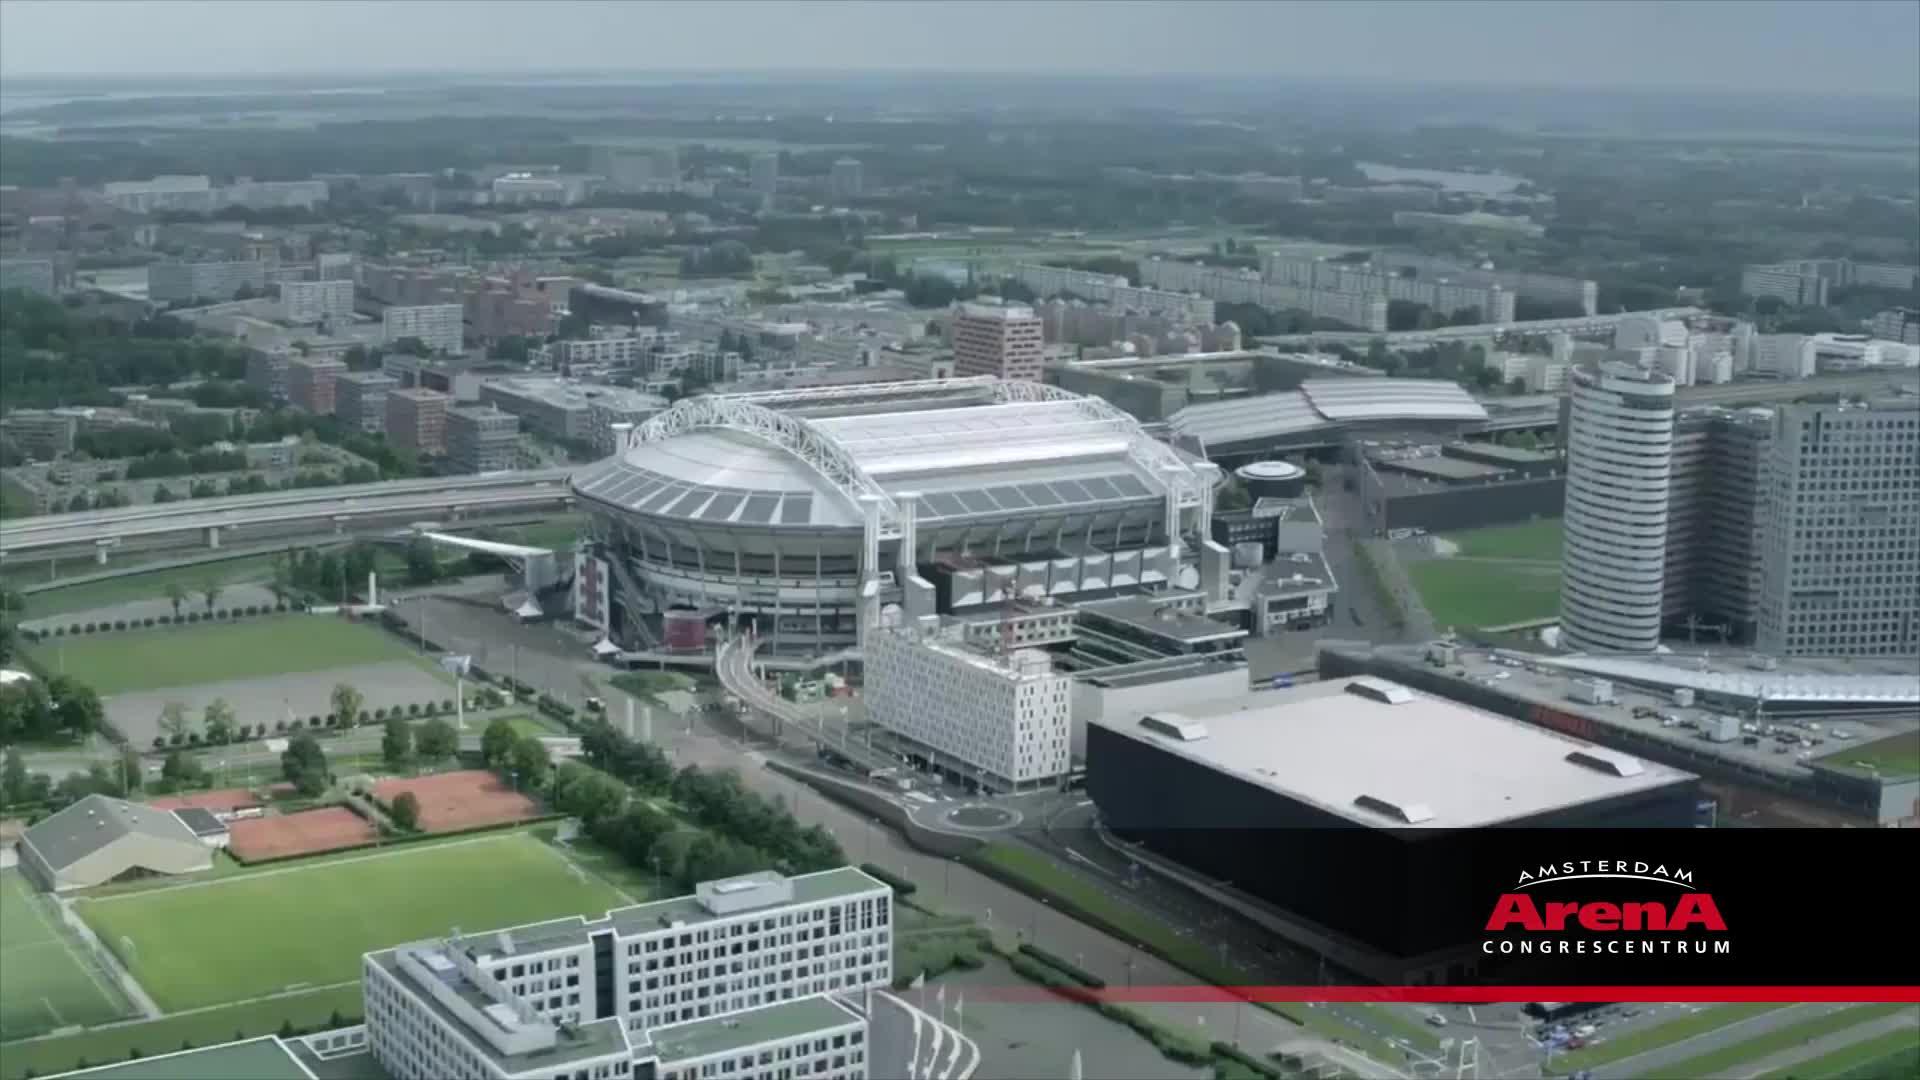 amsterdam, amsterdam arena, business events, congres, vergaderen, Showreel Amsterdam ArenA Congrescentrum GIFs